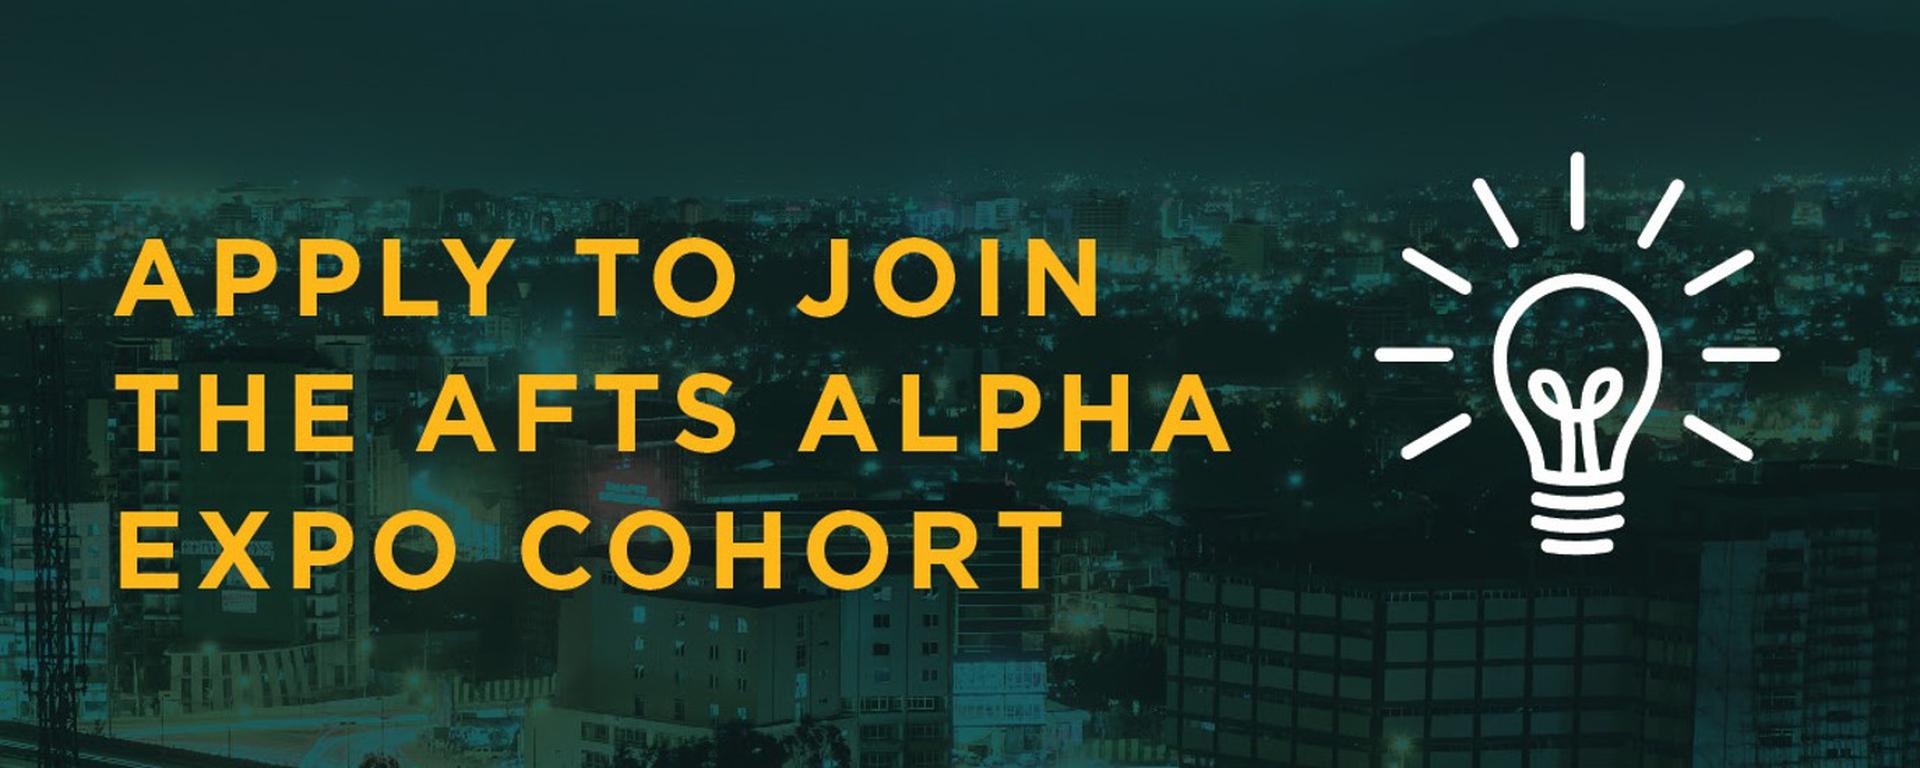 The Africa Fintech Summit - The Africa Fintech Summit, Ethiopia 2019 Movemeback African initiative cover image